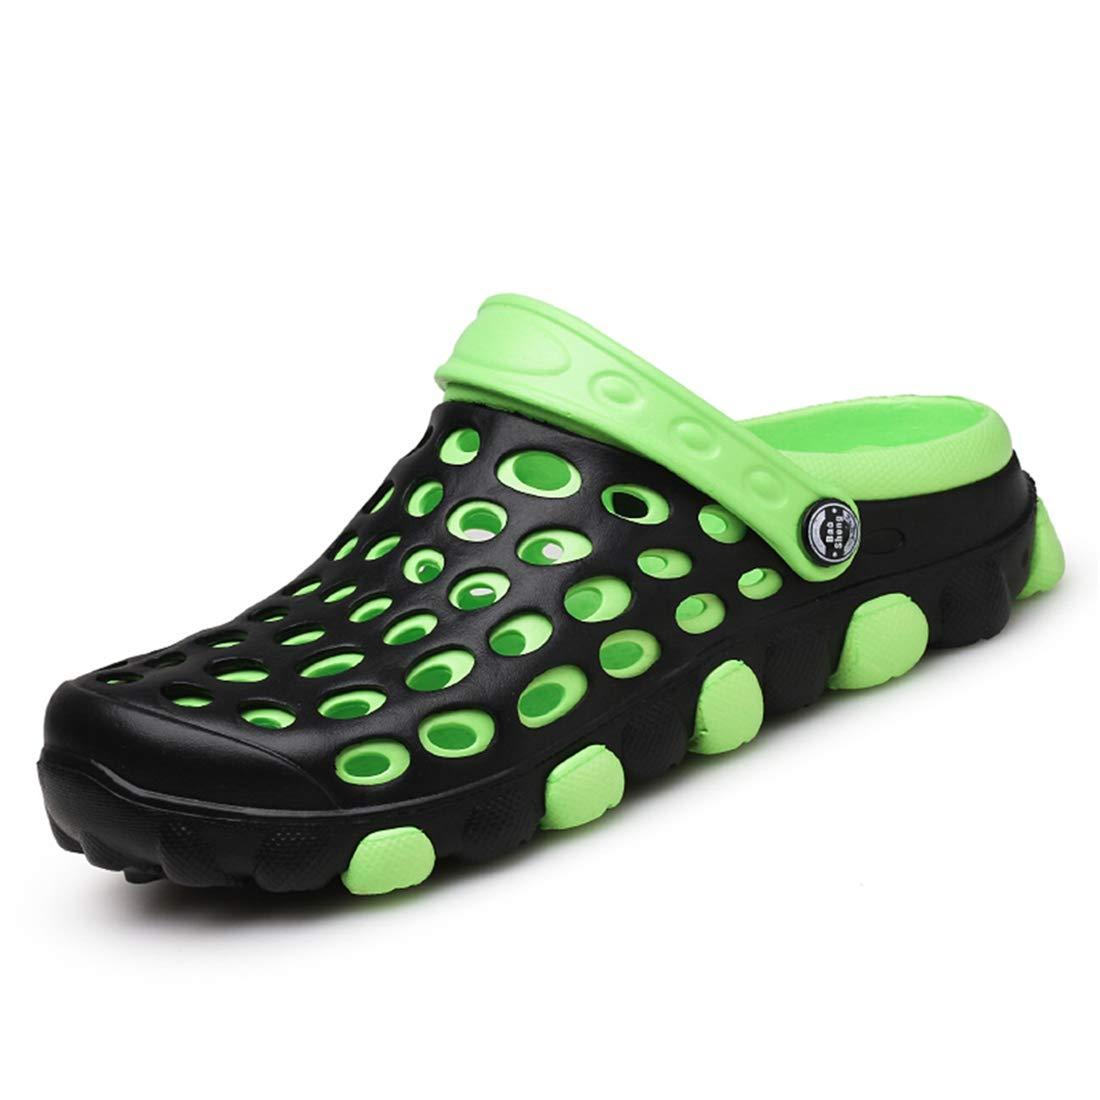 Men Garden Clogs Shoes House Slippers Sandals Indoor Outdoor Shower Plastic Slip on Sandals Slippers Green 270mm:10 D(M) US Men